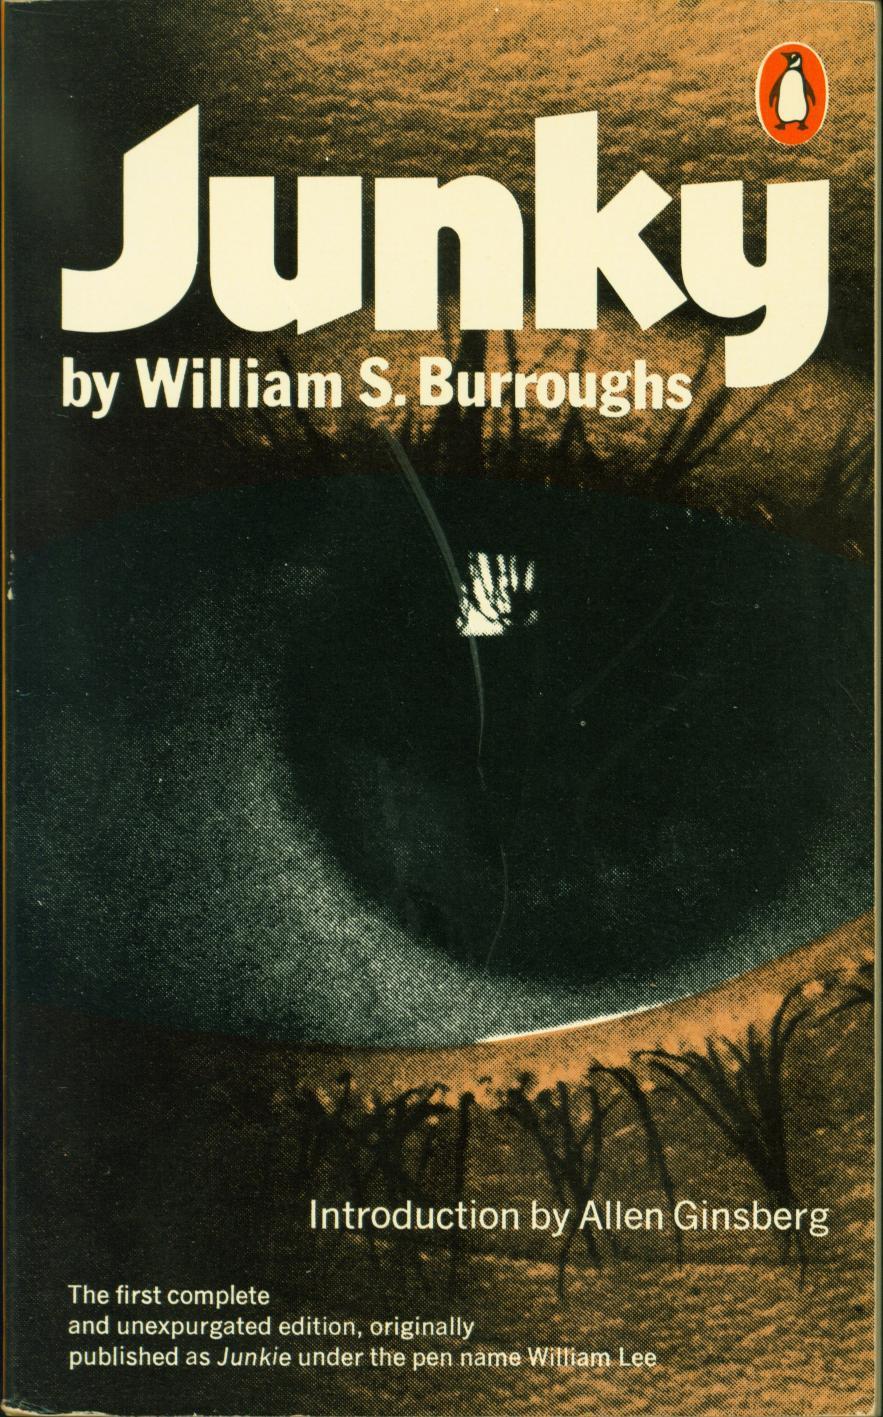 Image result for william s. burroughs